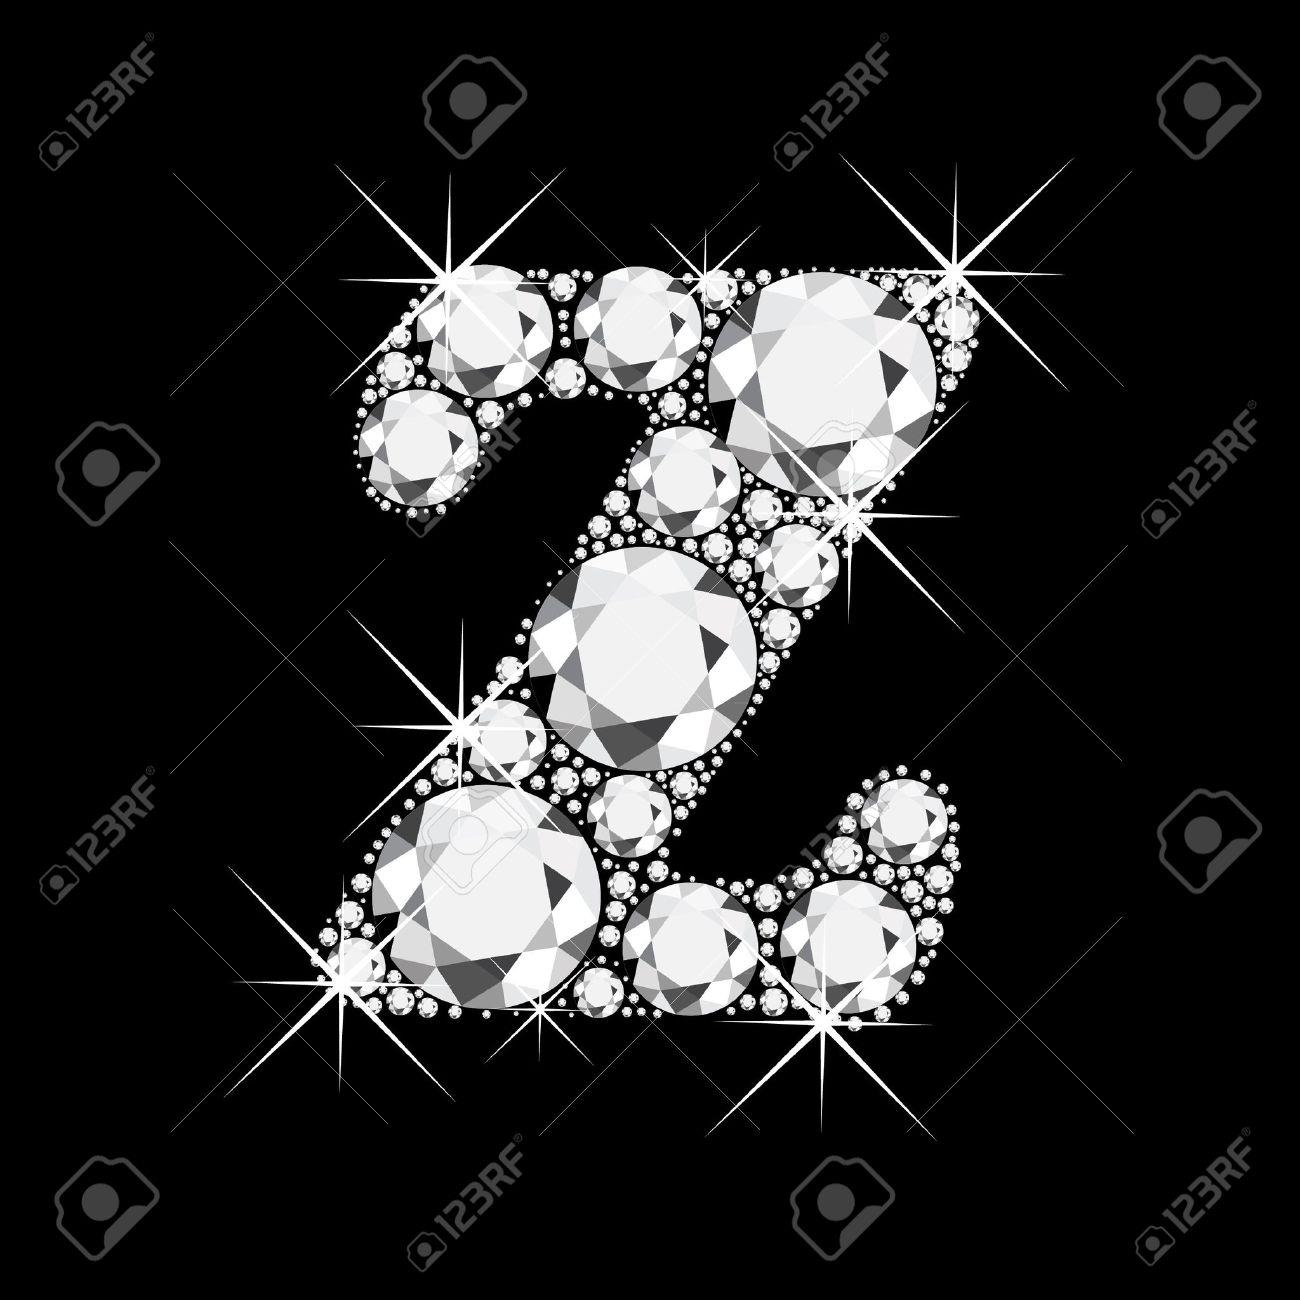 Z Letter With Diamonds Bling V Wallpapers For Mobile